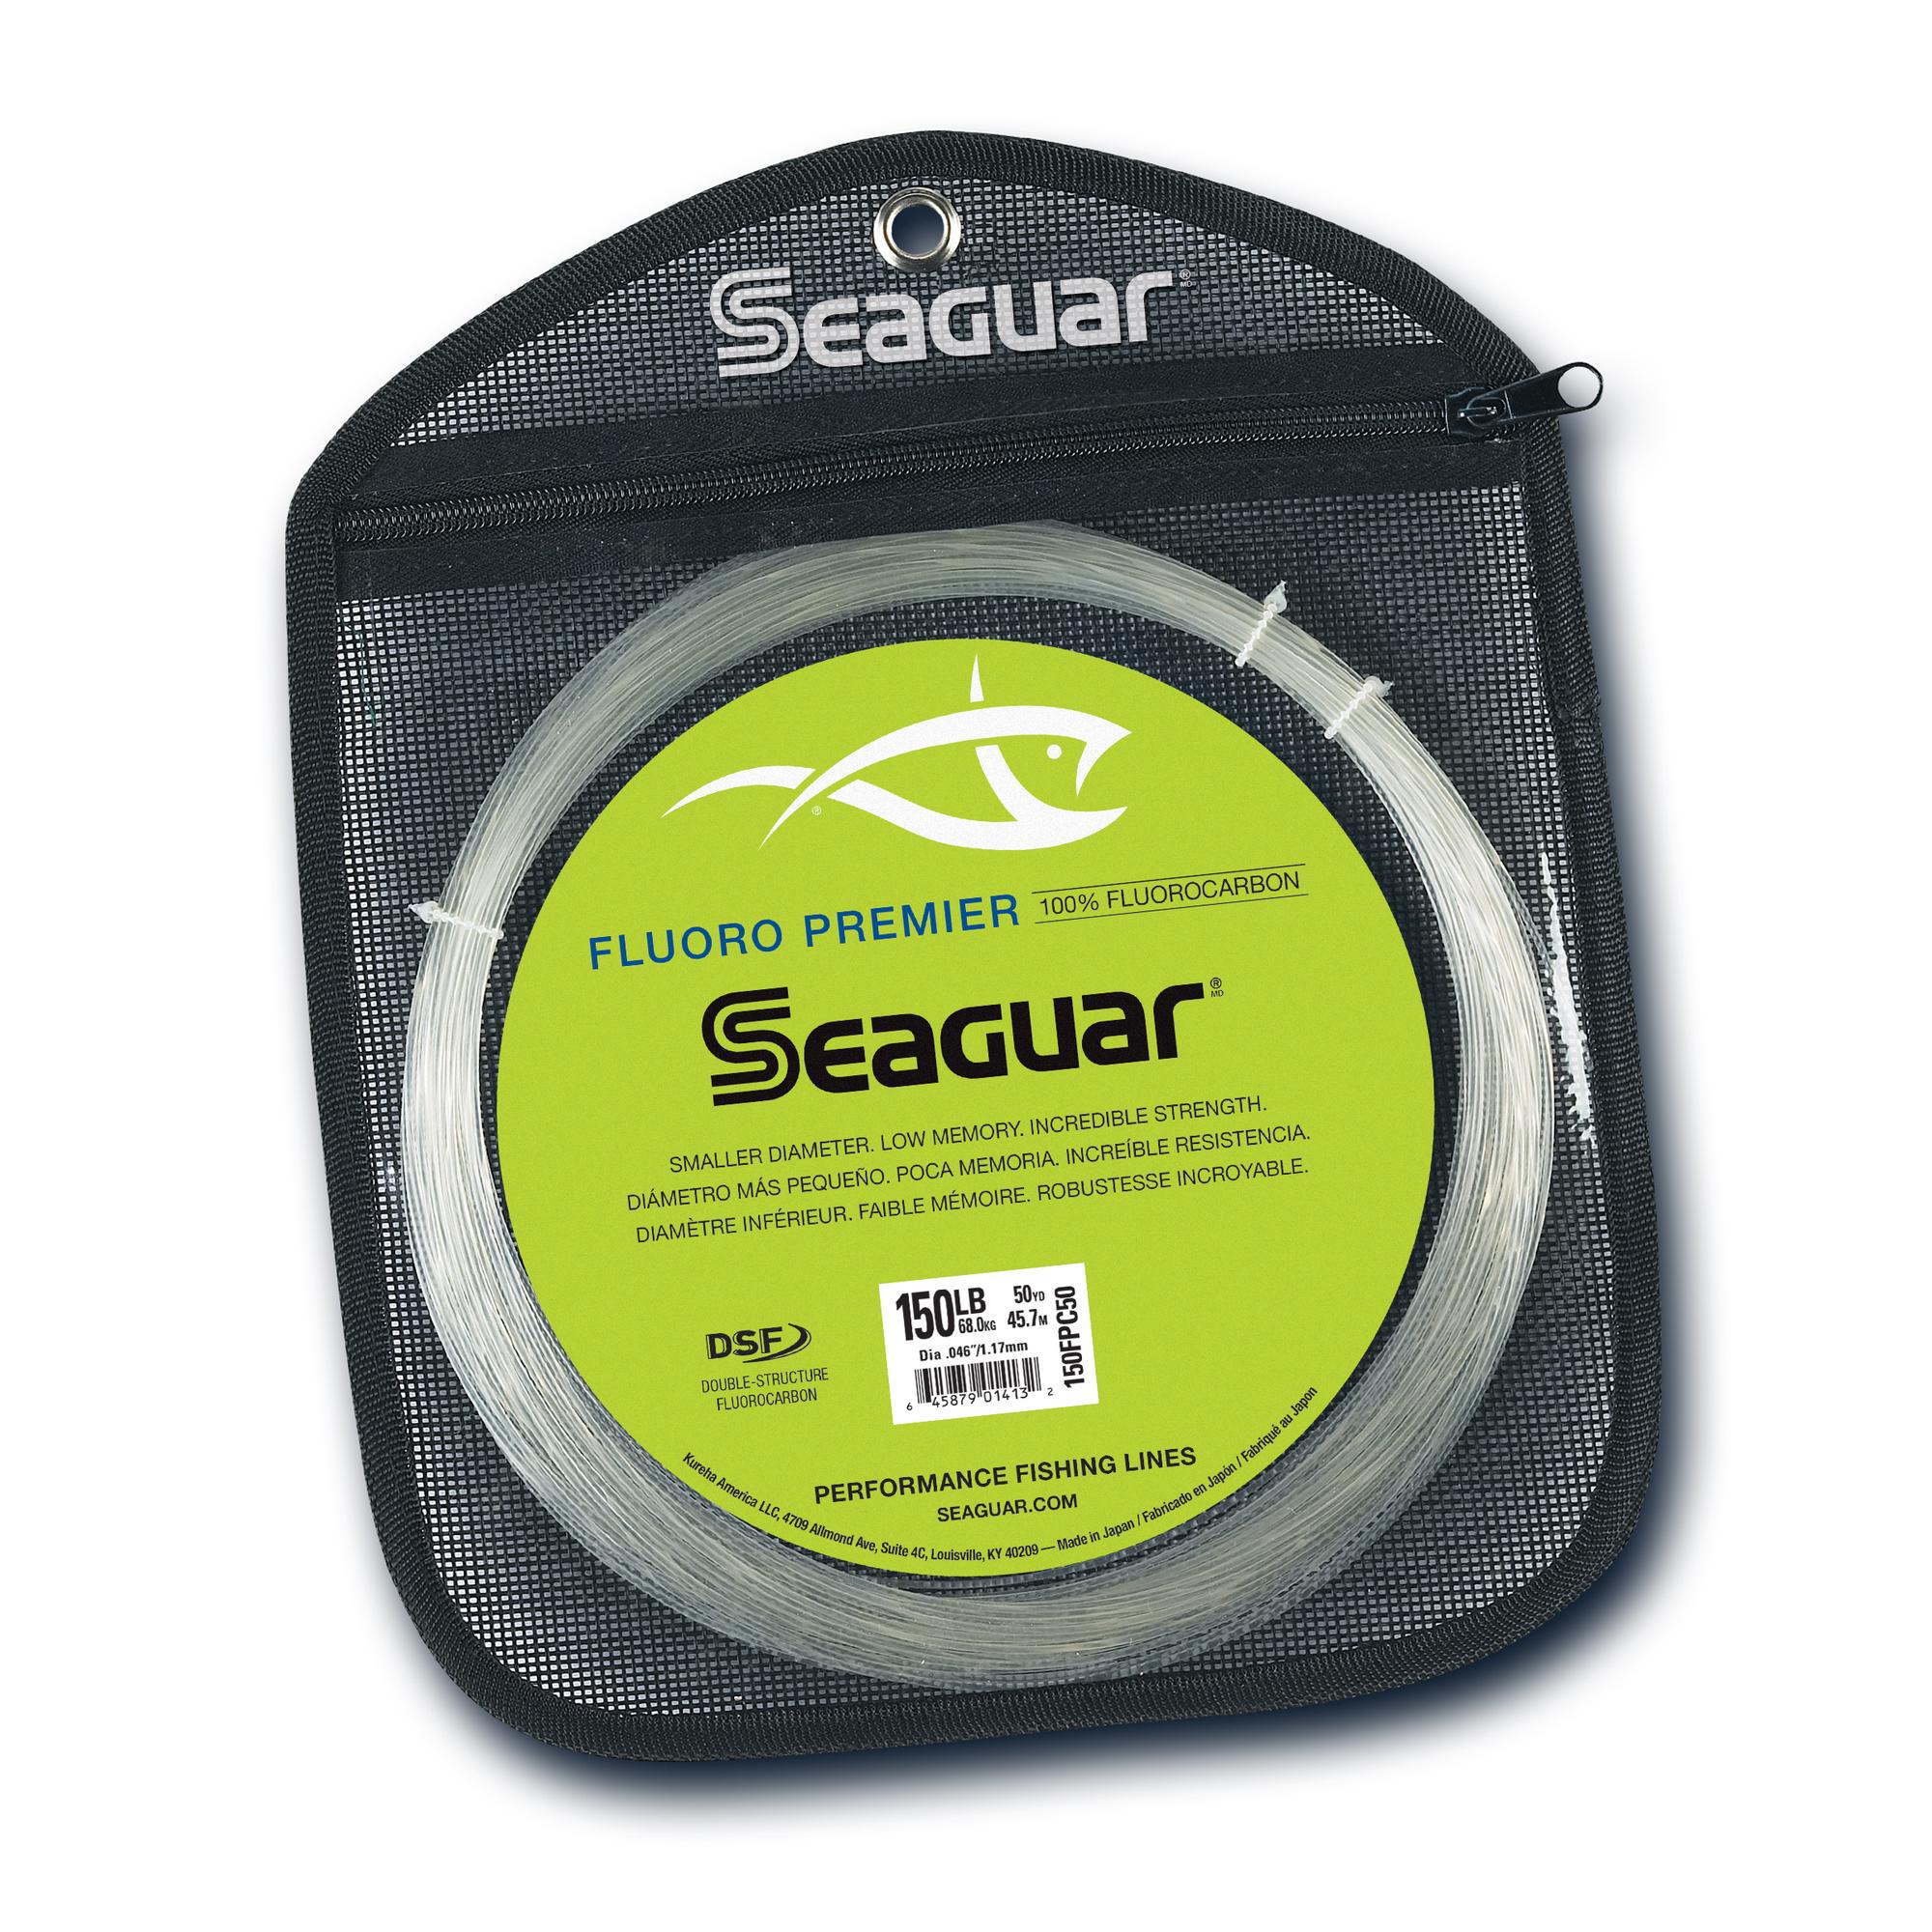 Seaguar Fluoro Premier Big Game Fishing Line 50 150LB